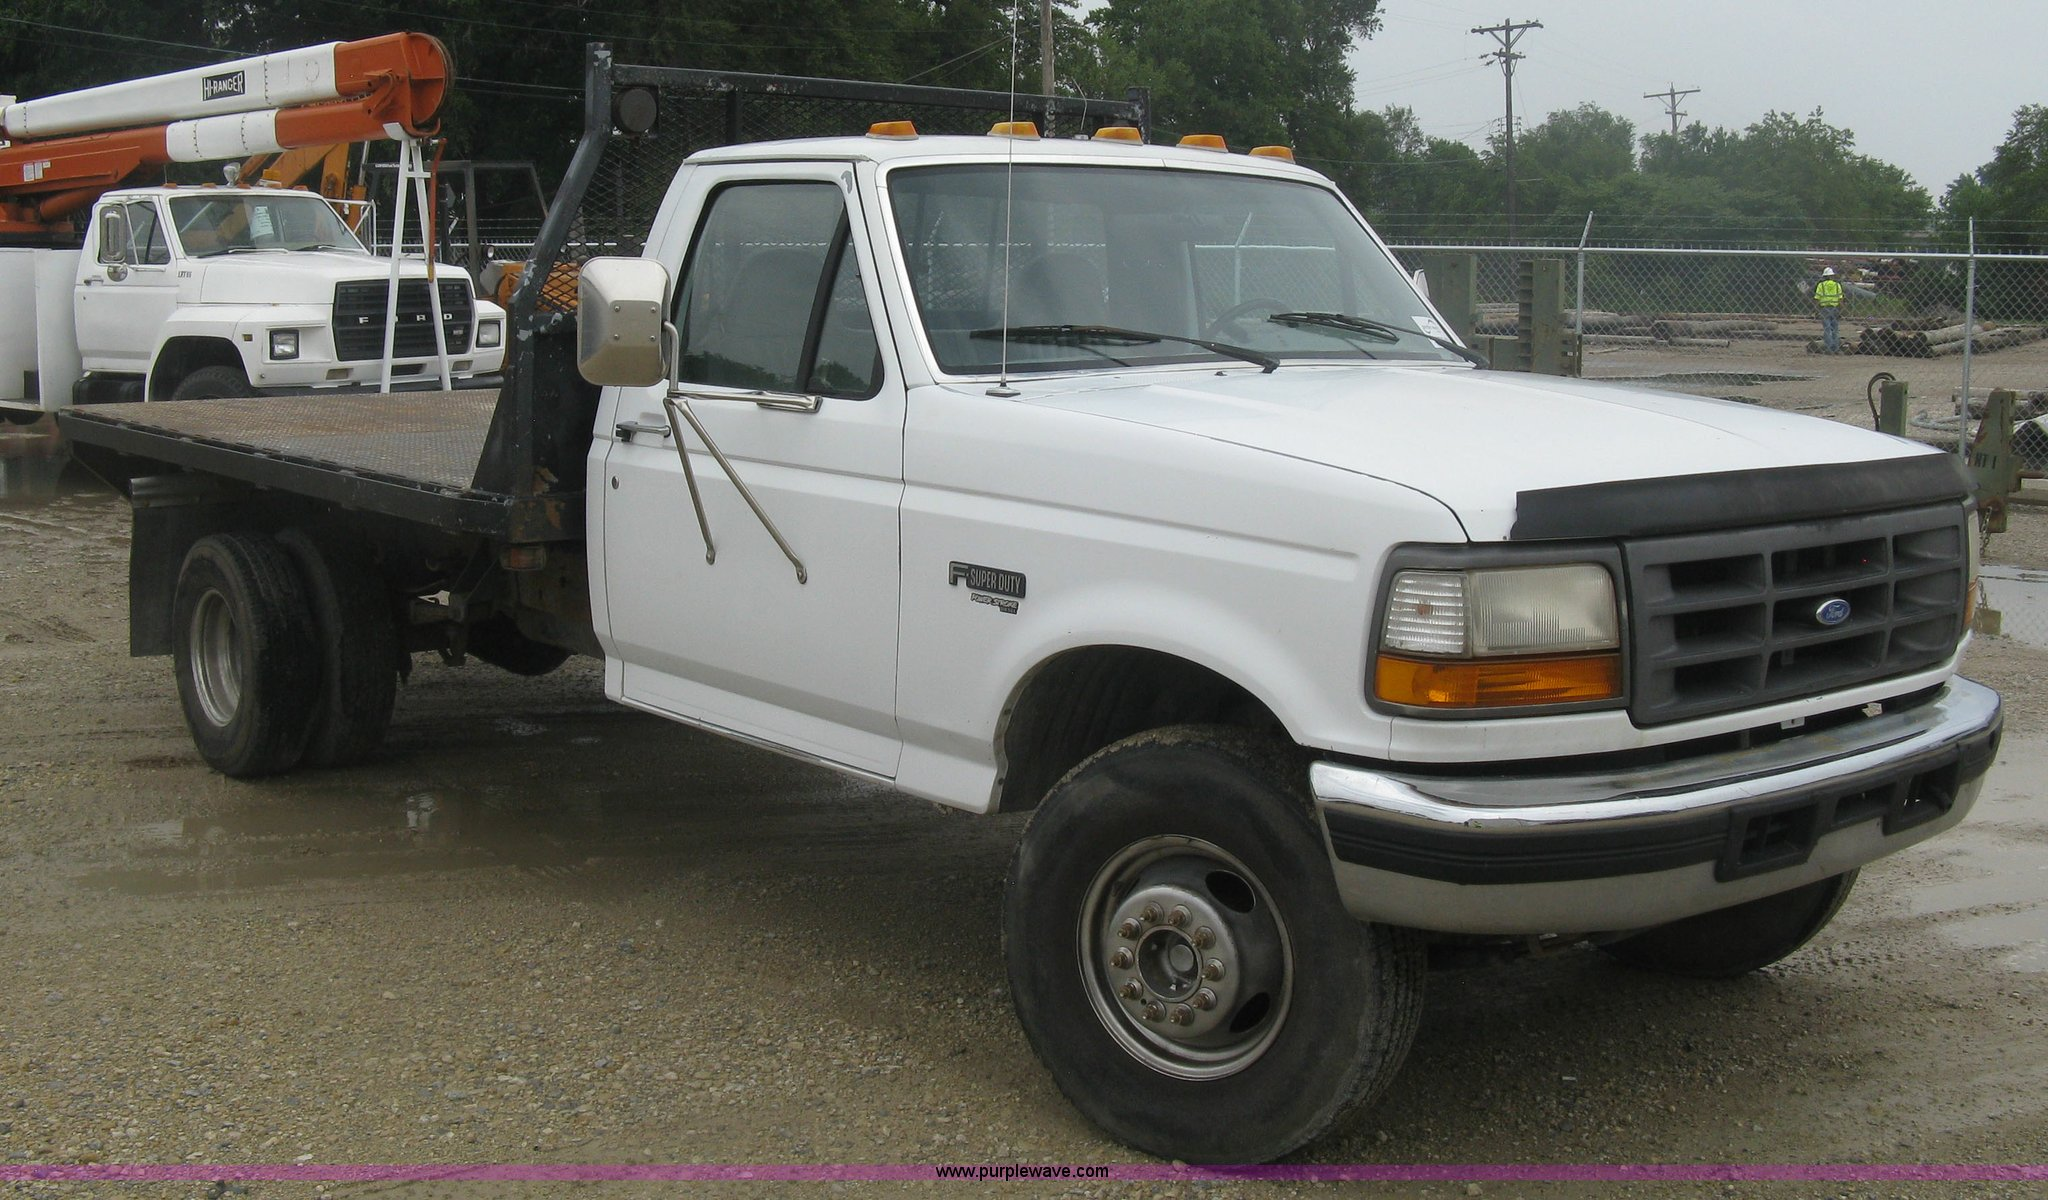 1997 Ford F450 Super Duty Flatbed Truck In Wichita Ks Item K8677 Sold Purple Wave